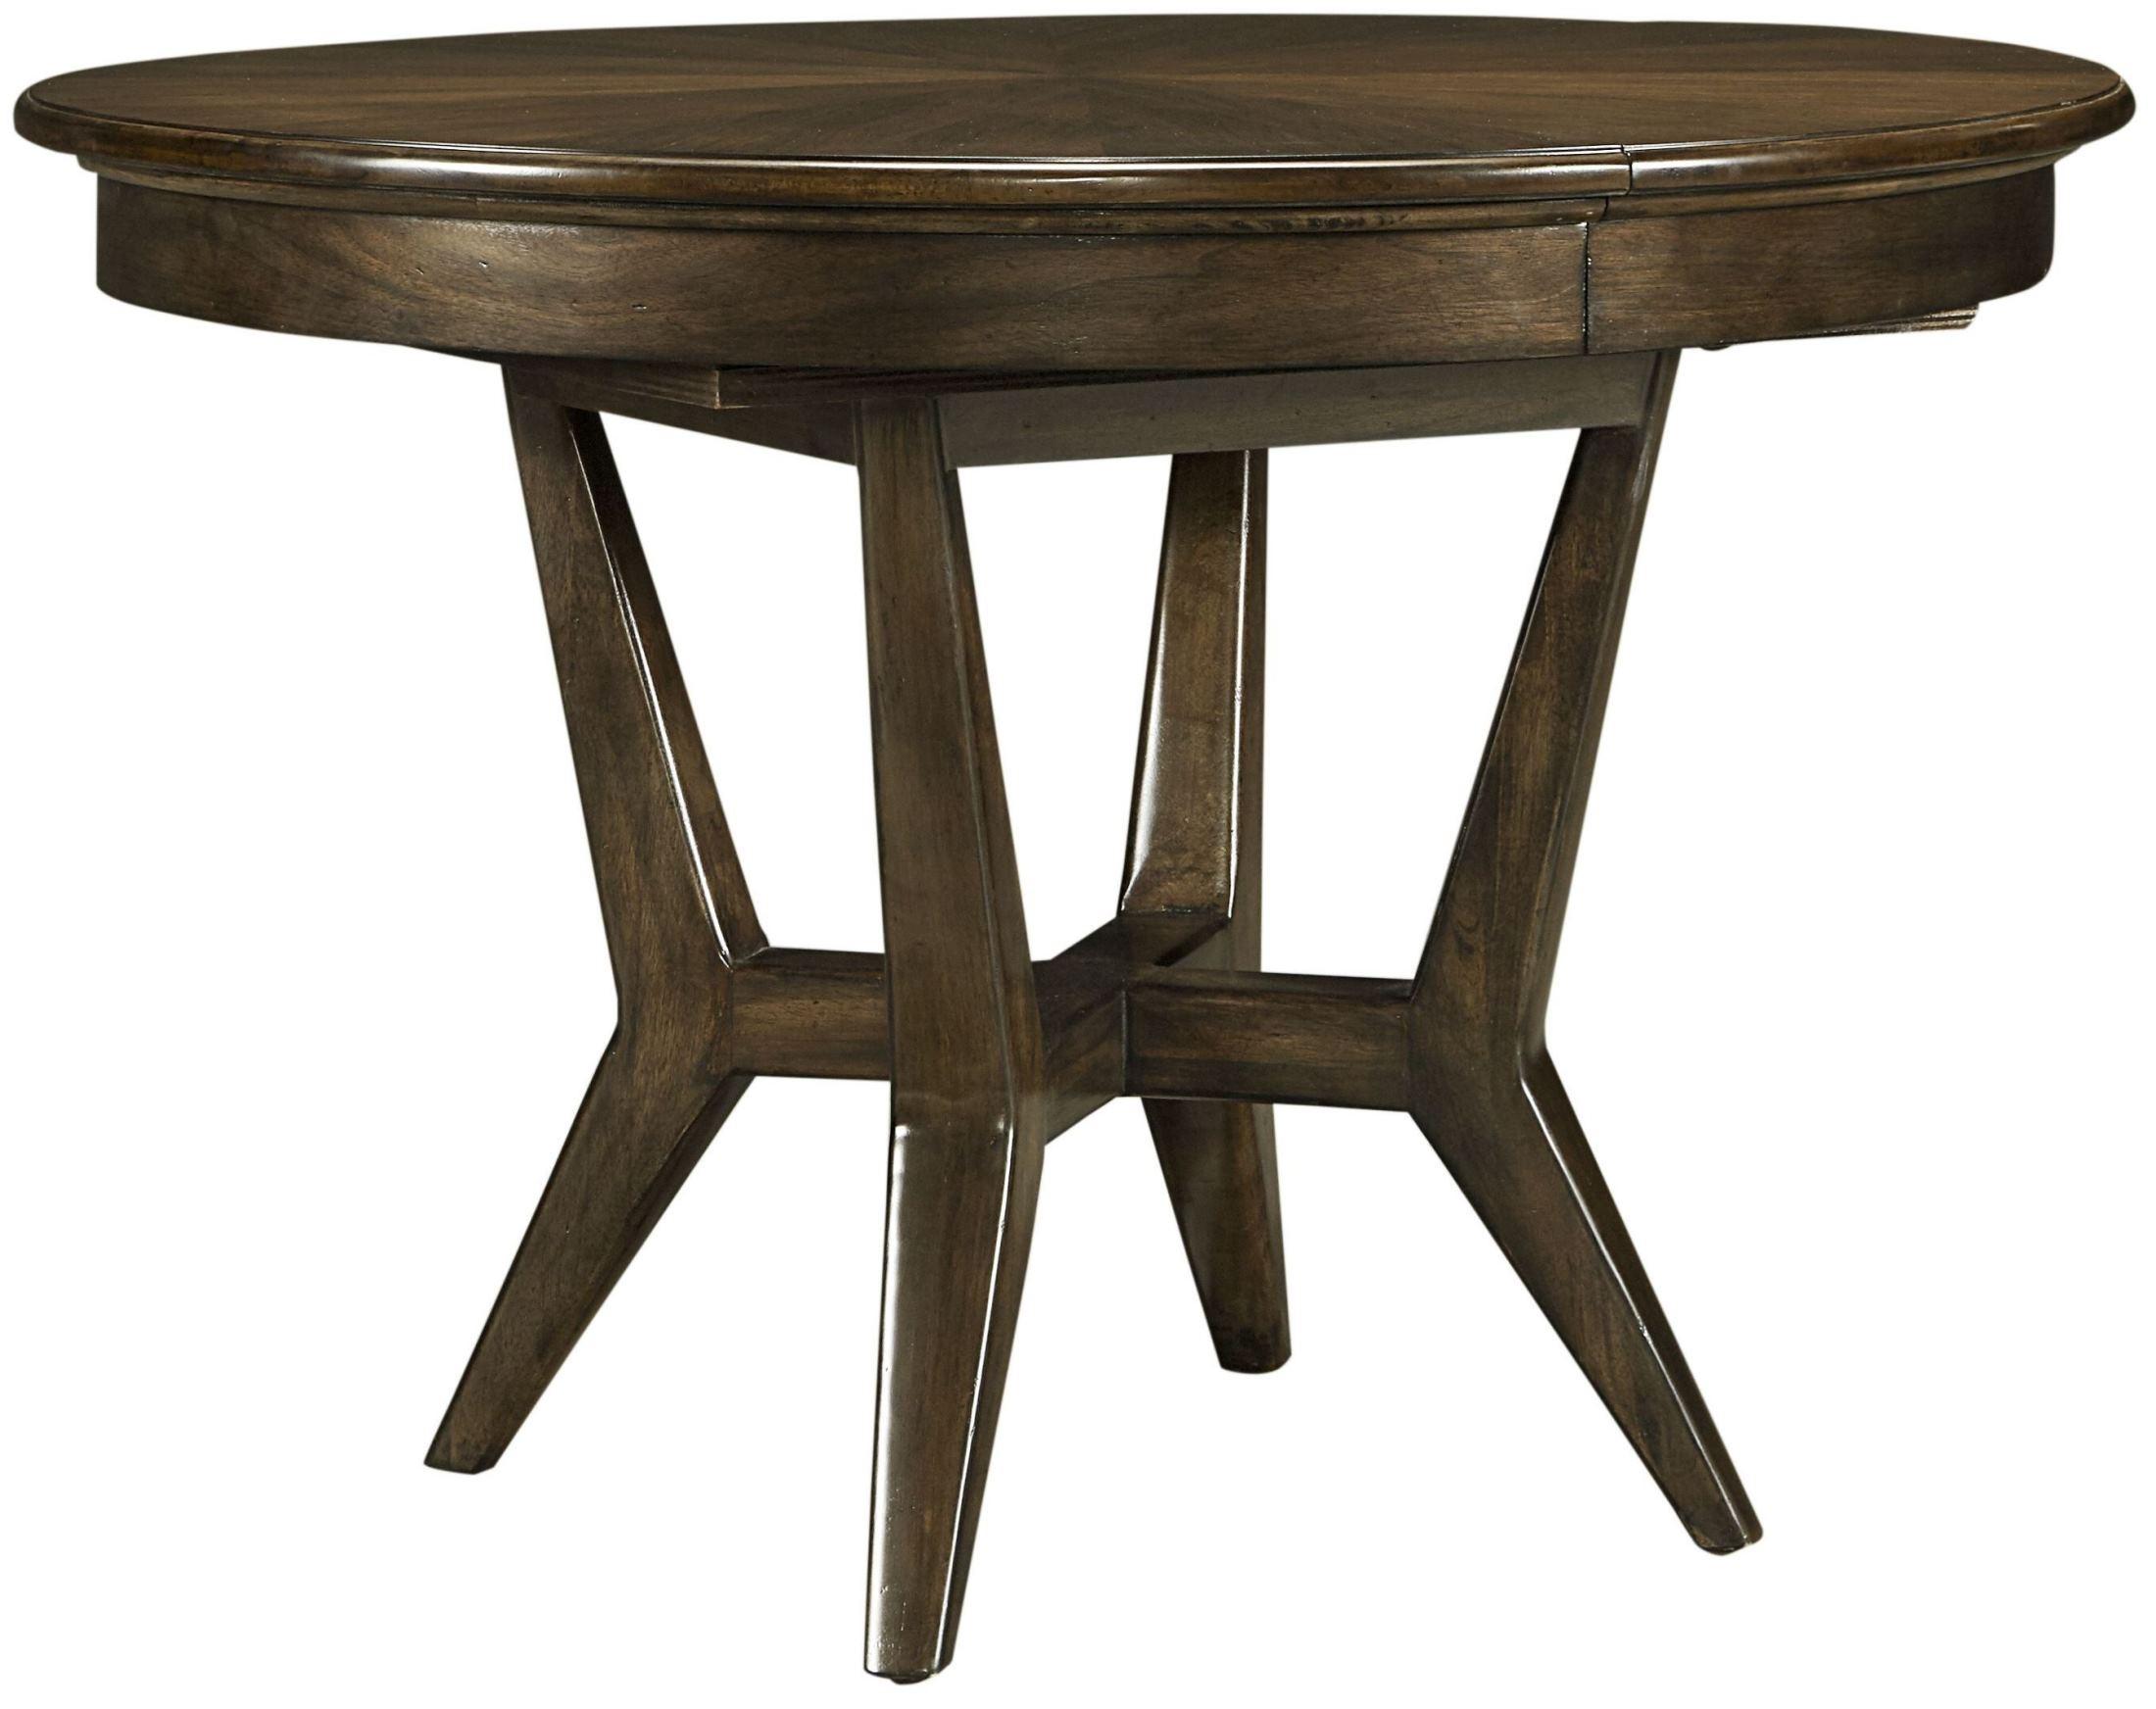 santa clara burnished walnut extendable round dining table 585 11 30 stanley furniture. Black Bedroom Furniture Sets. Home Design Ideas